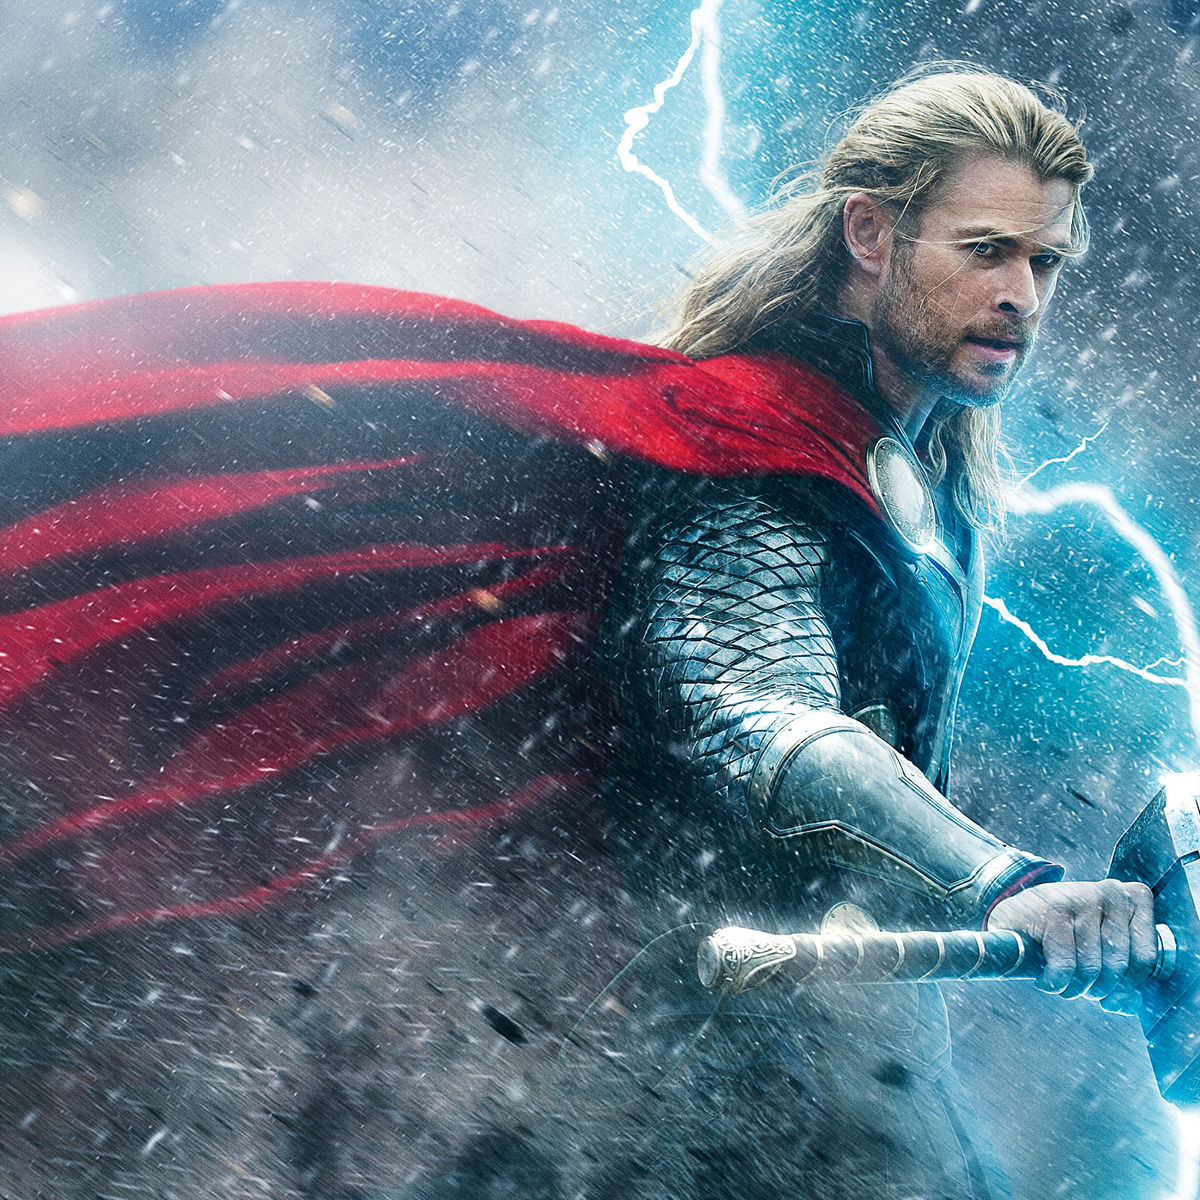 Thor-The-Dark-World-Wide-Image.jpg